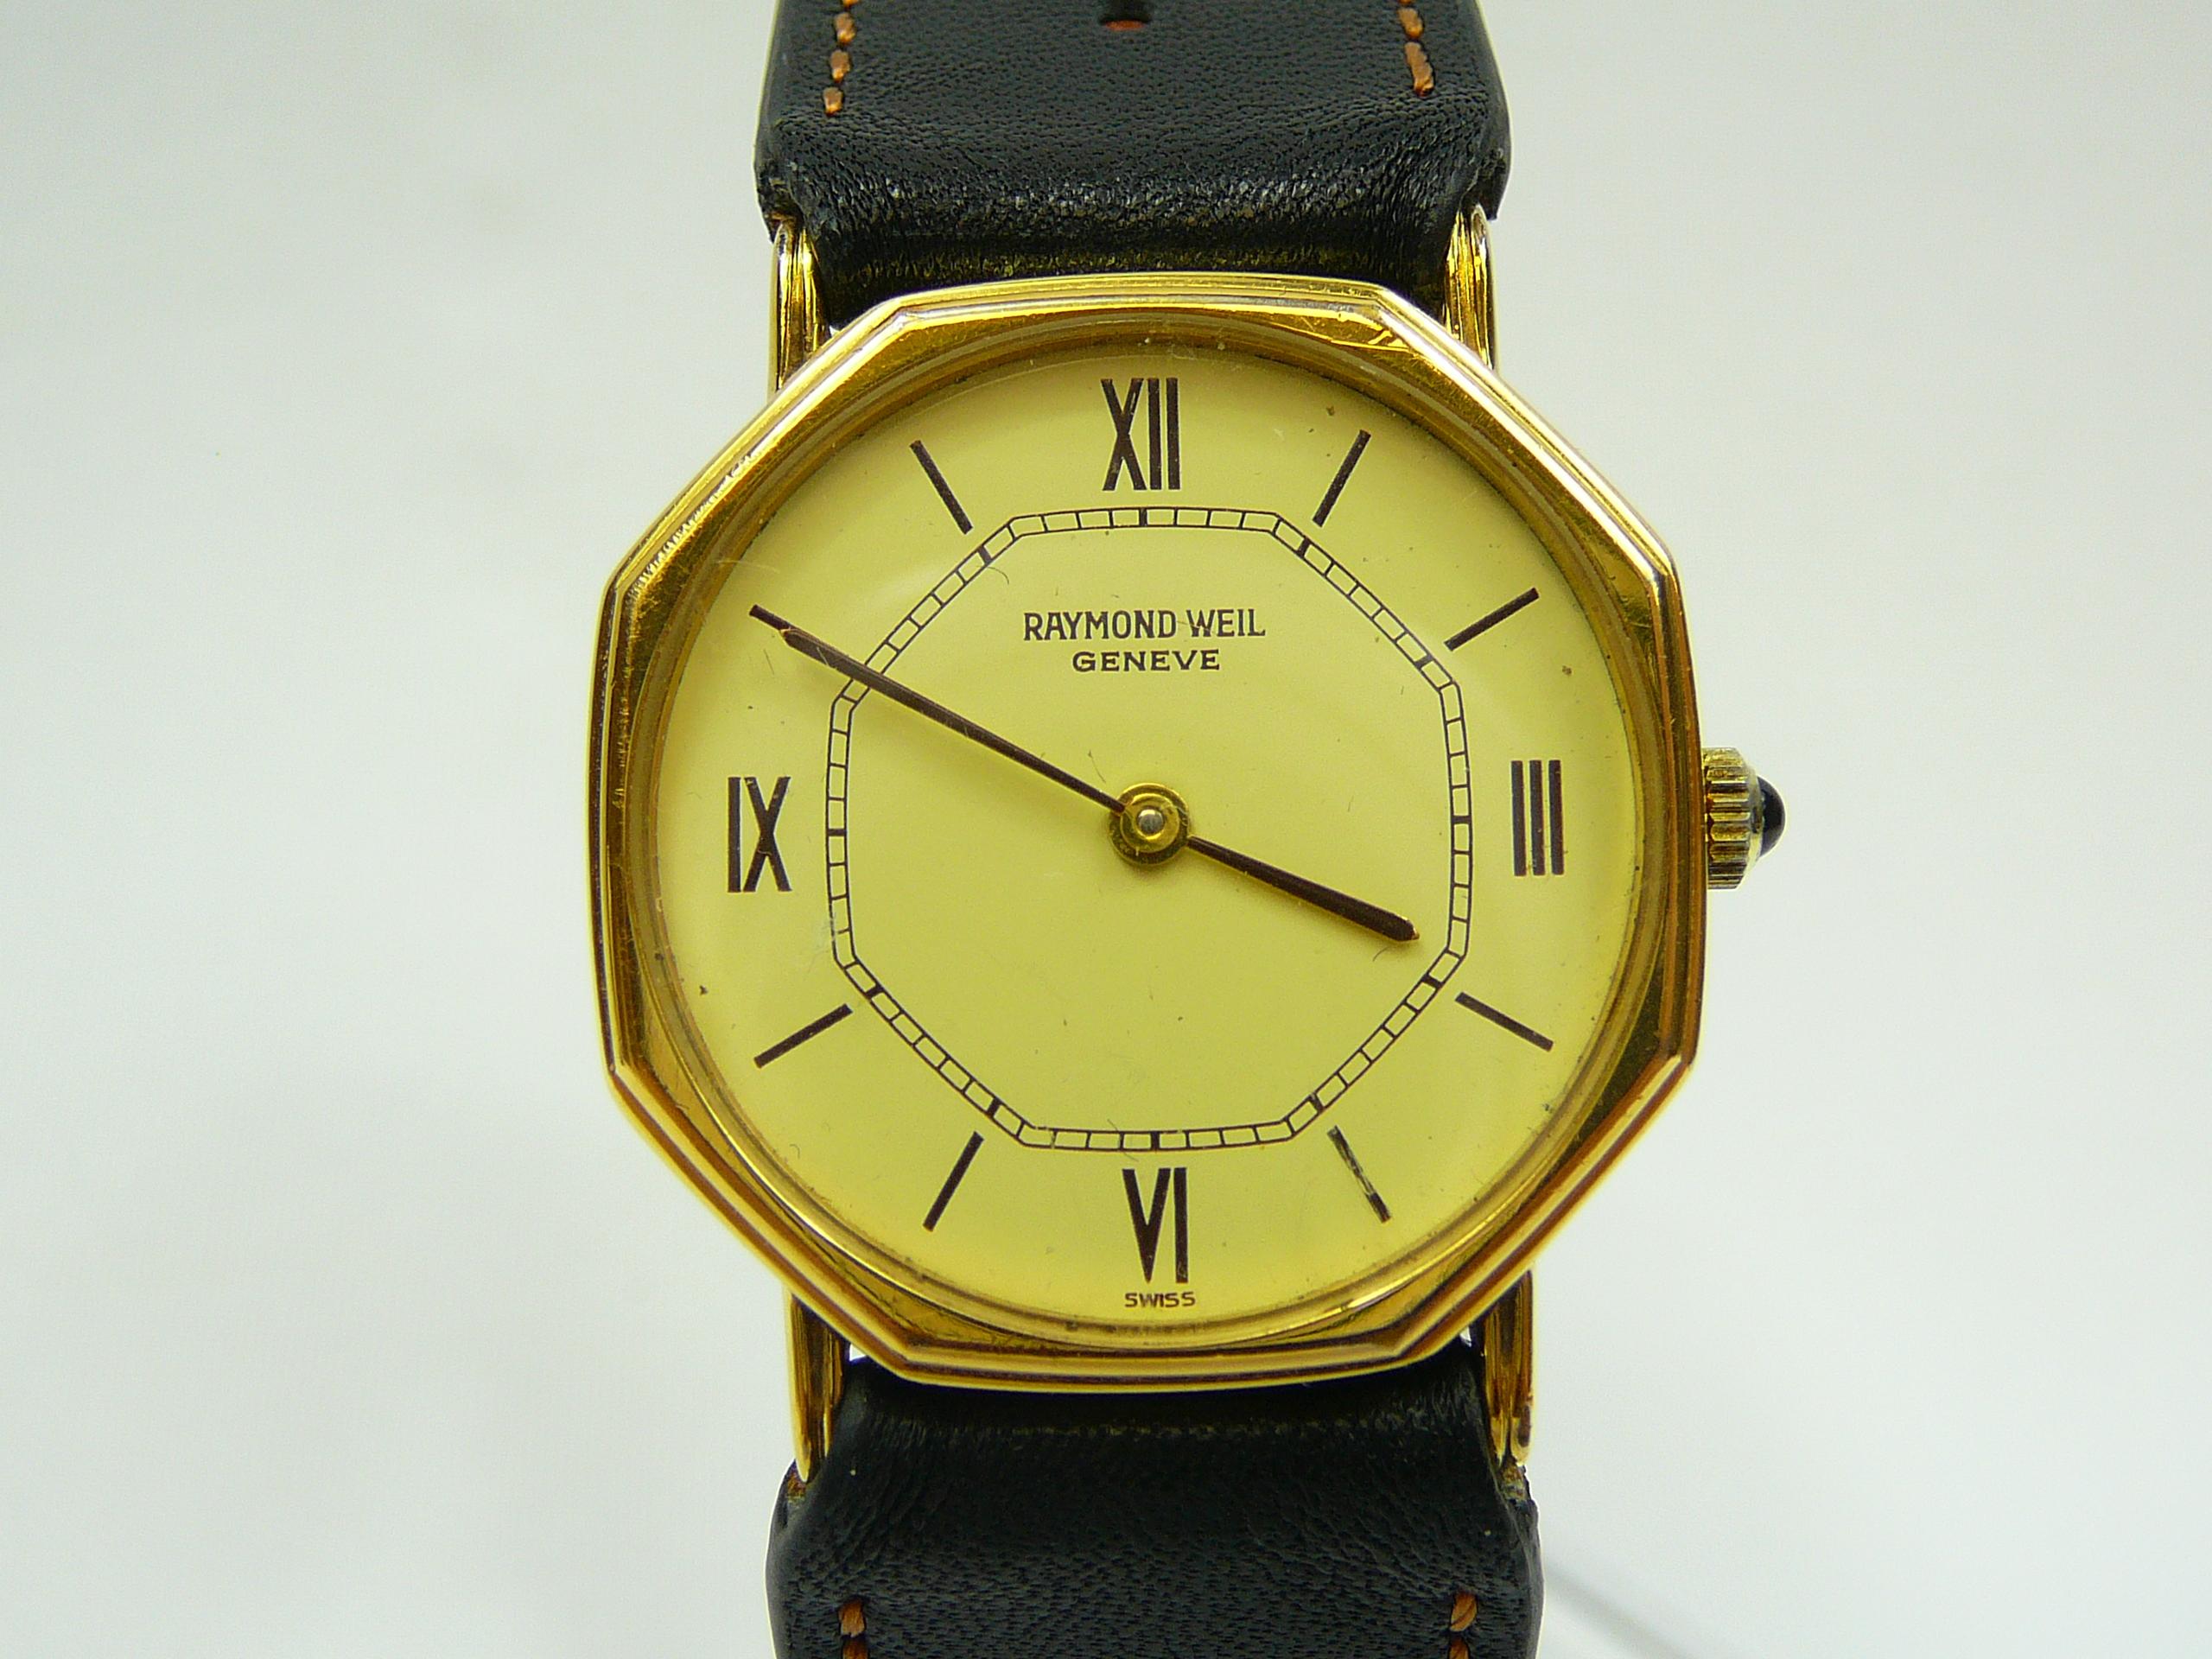 Lot 8 - Gents Raymond Weil Wrist Watch